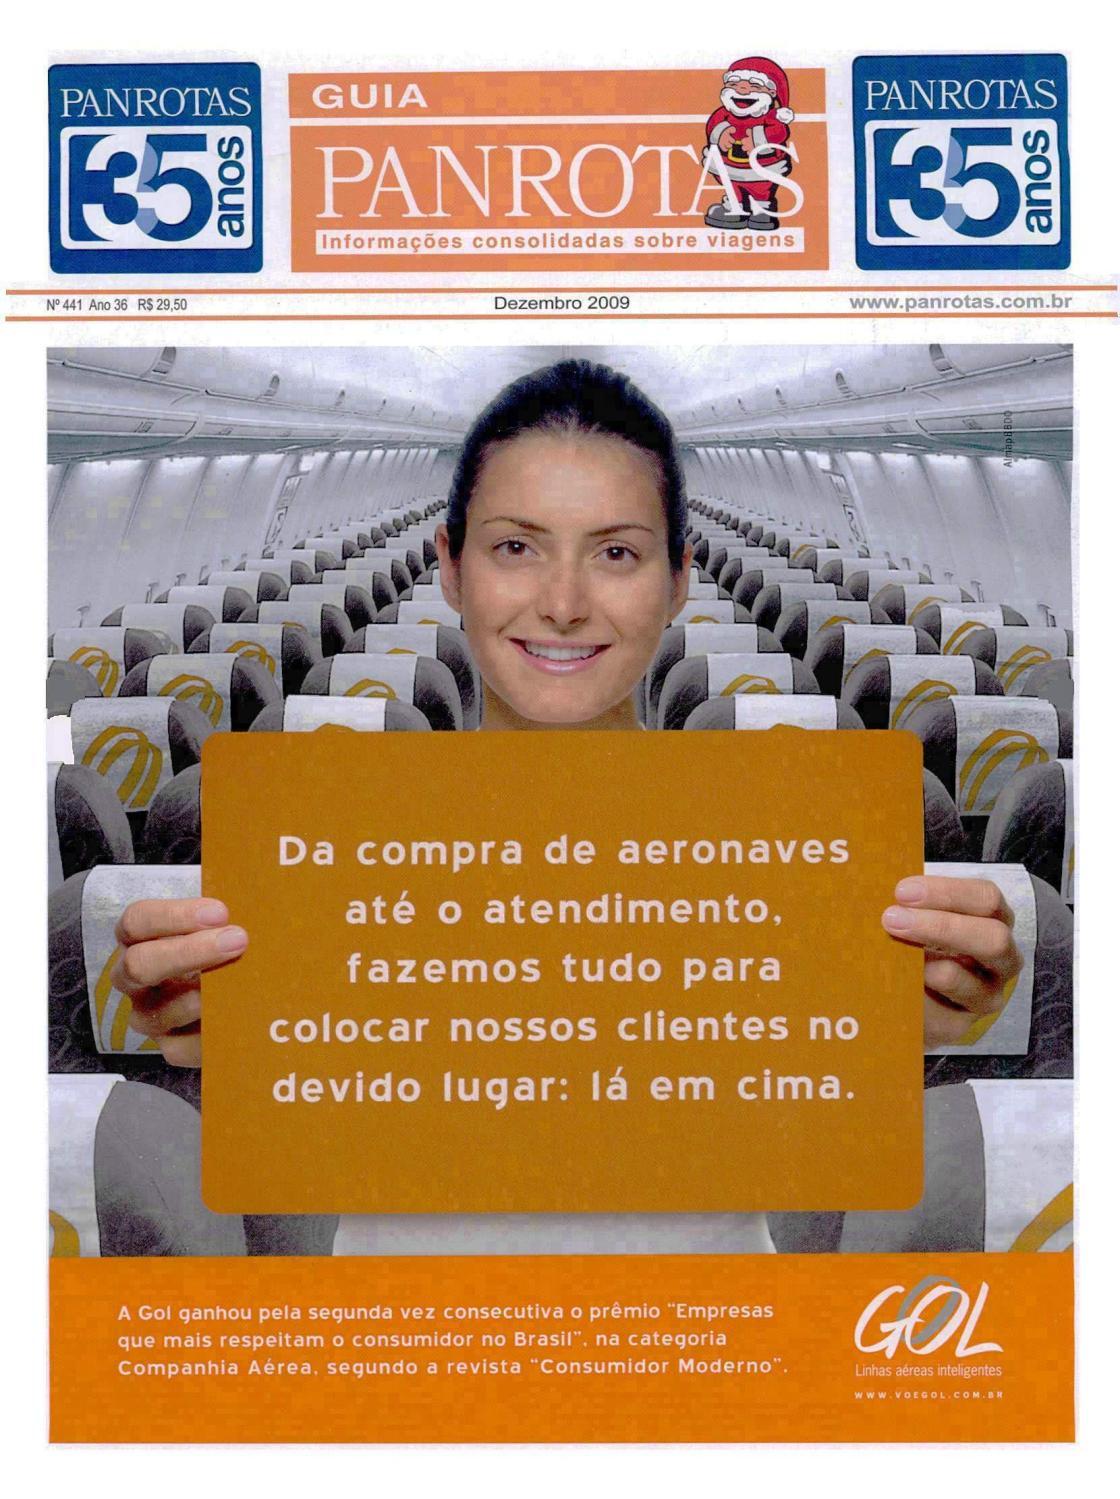 1c615998f6 Guia PANROTAS - Edição 441 - Dezembro 2009 by PANROTAS Editora - issuu